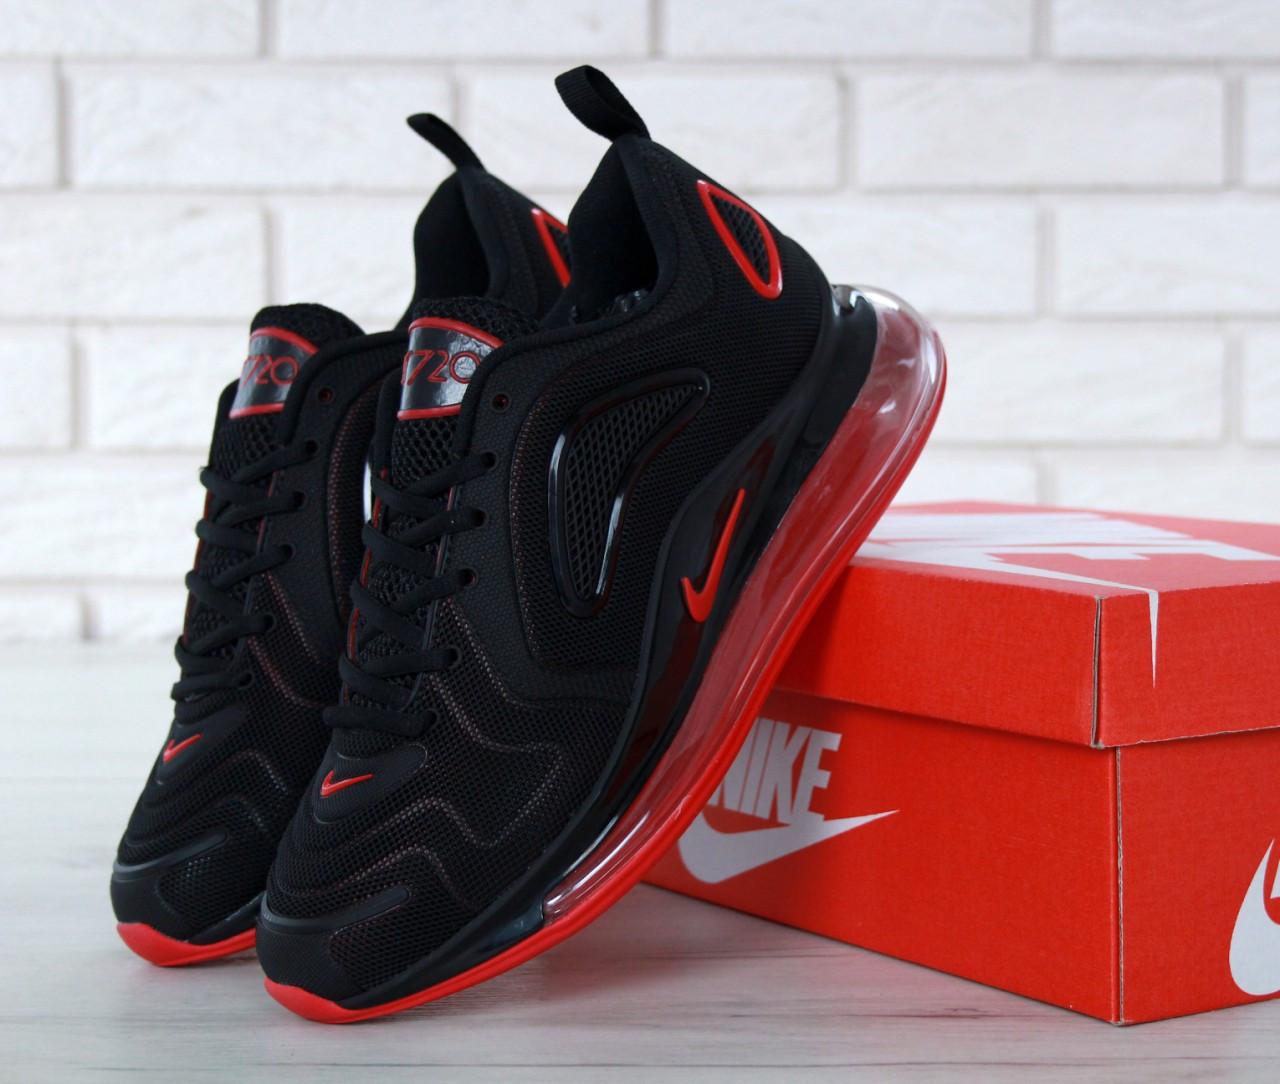 Кроссовки мужские Найк Nike Air Max 720 Black/Red. ТОП Реплика ААА класса.